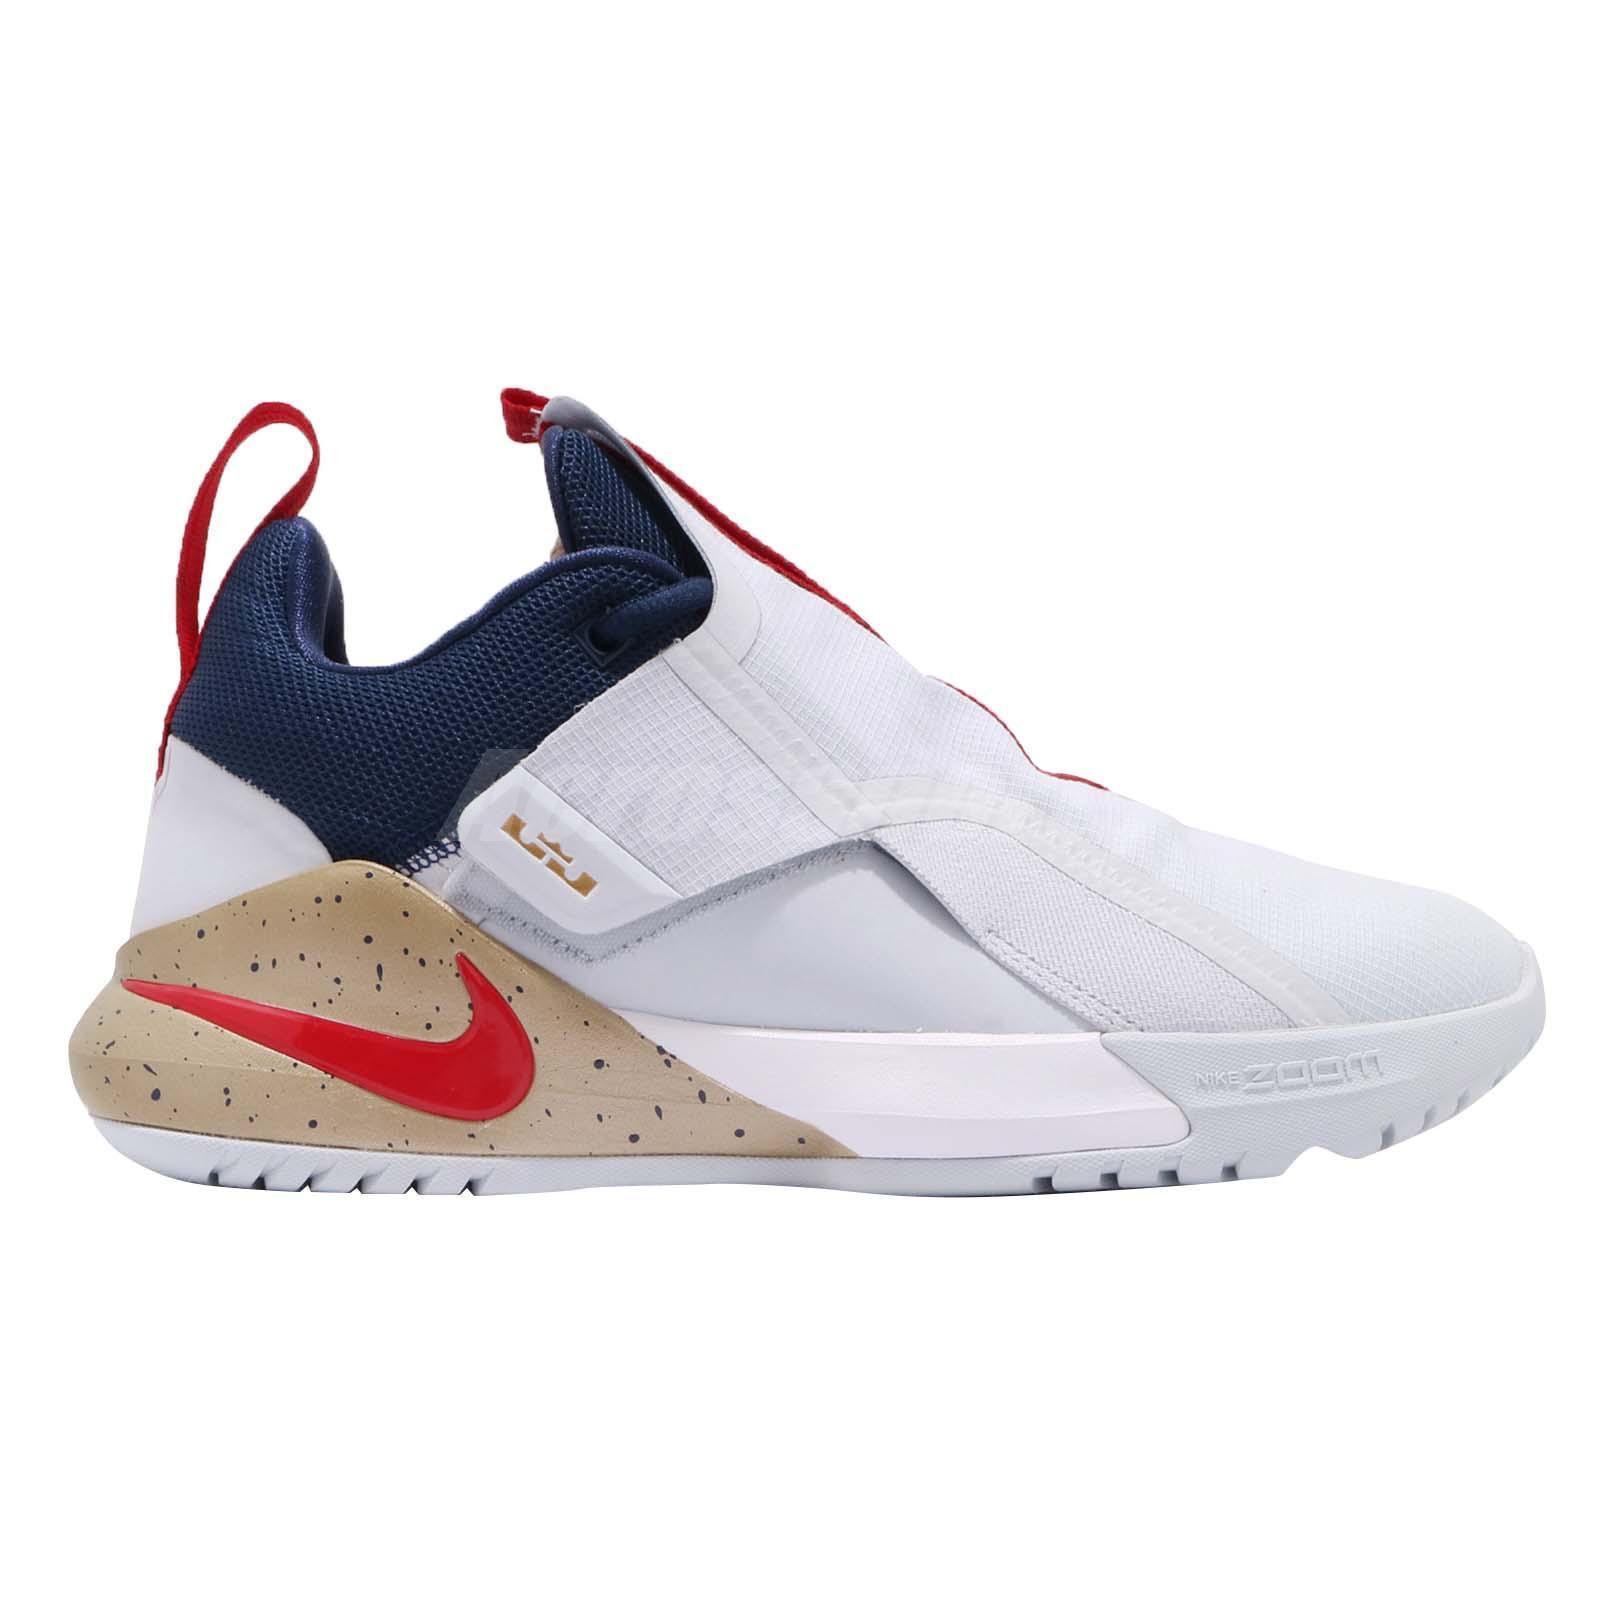 competitive price 8d48e 889b3 LeBron James' Newest Sneaker, the LeBron Ambassador 11, Just ...